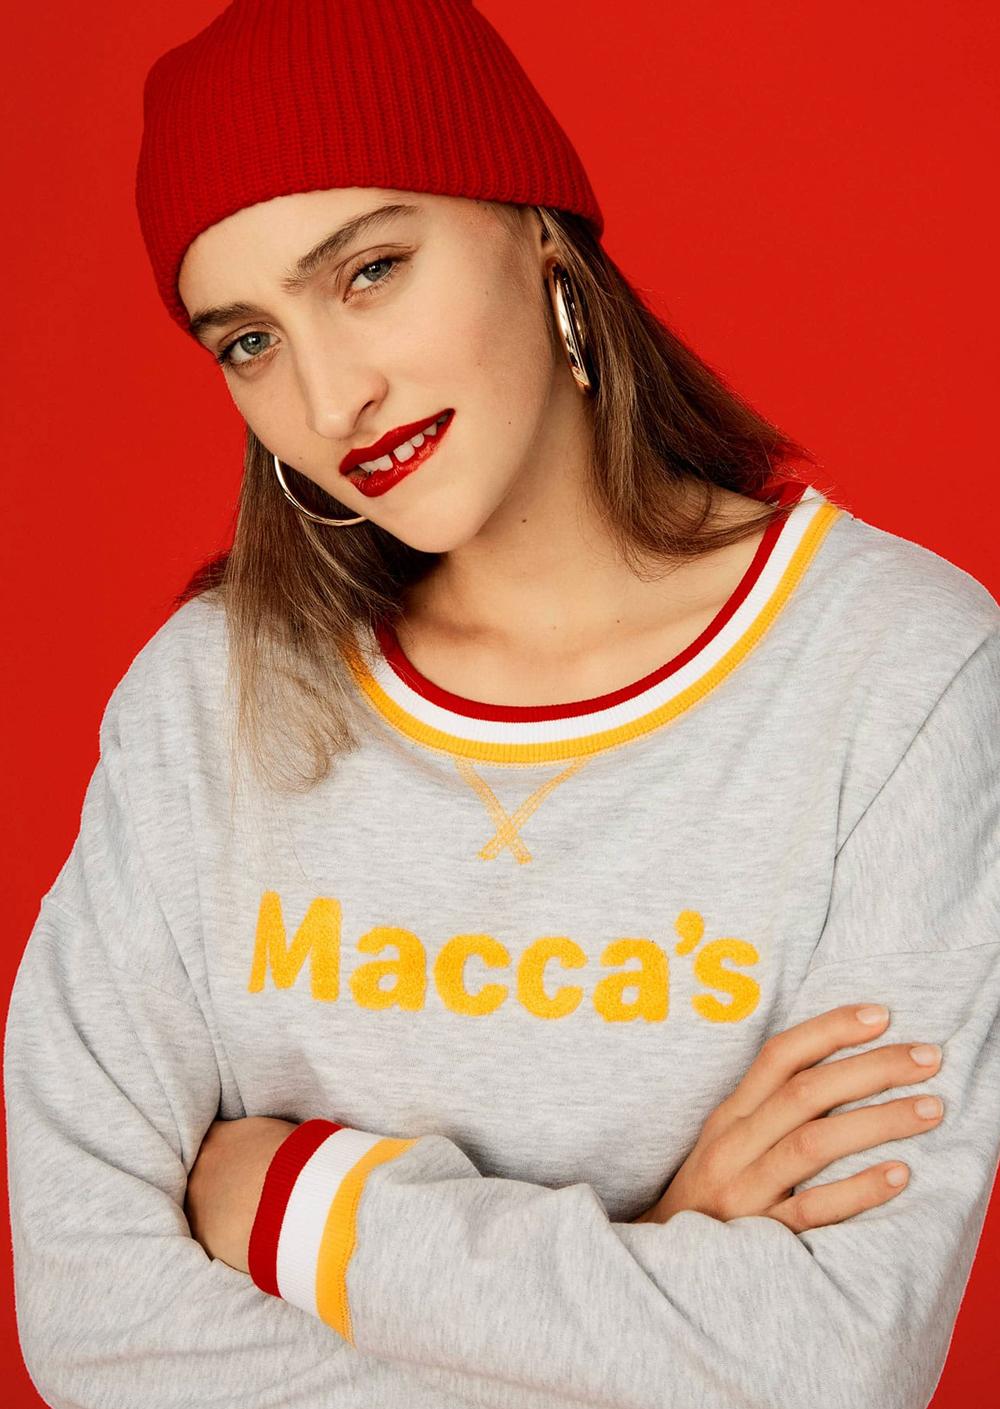 Maccas 1